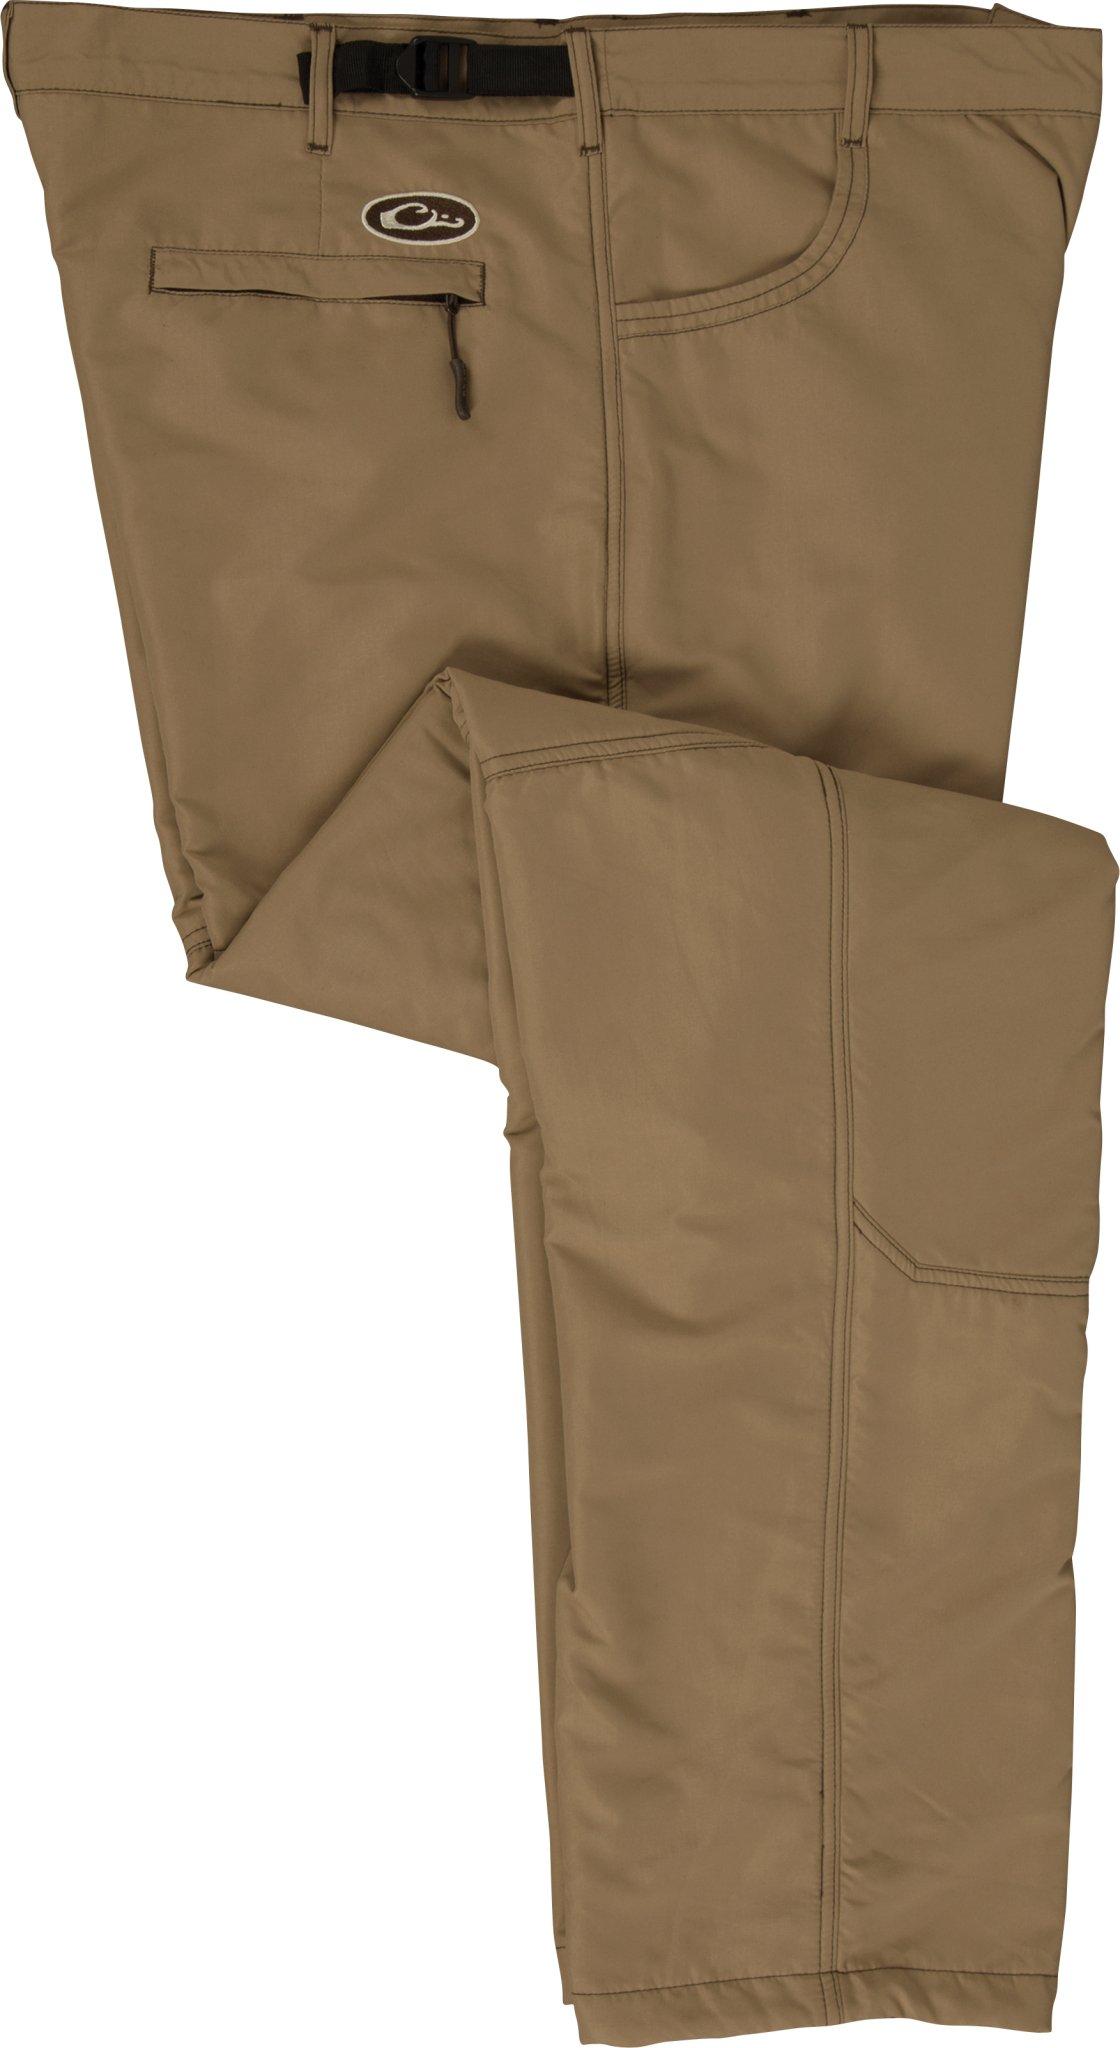 Drake MST Jean Cut Wader Pant, Color: Khaki, Size: XX-Large (DW1590-KHK-5)